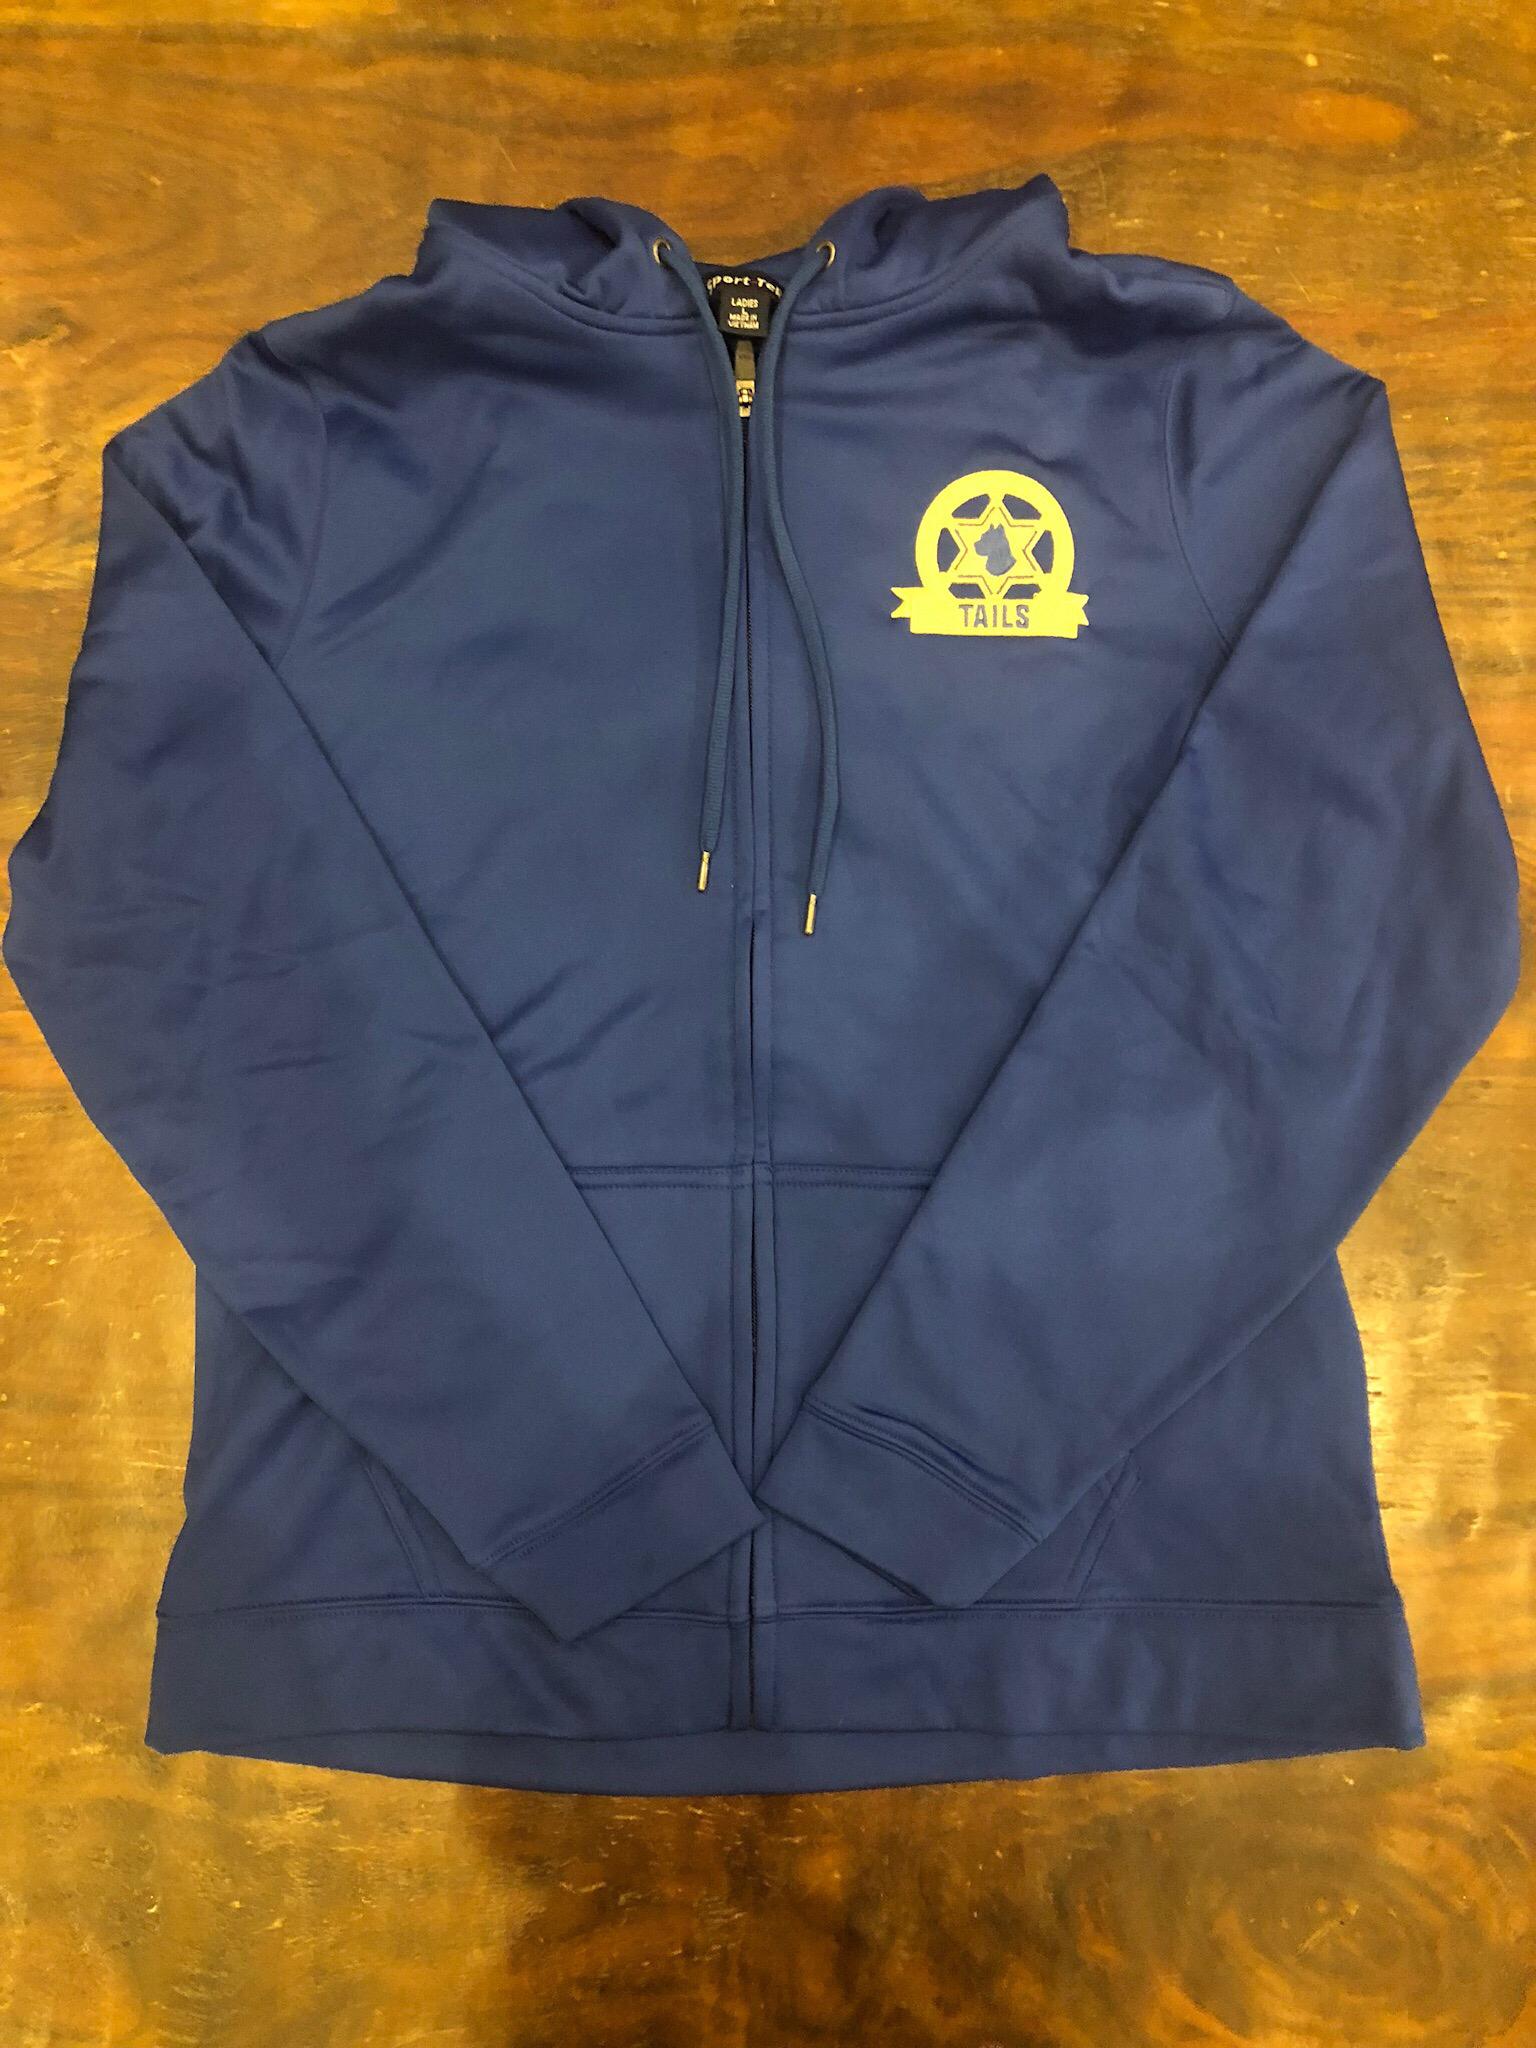 Blue TAILS hooded, zip front jacket - Medium 55710